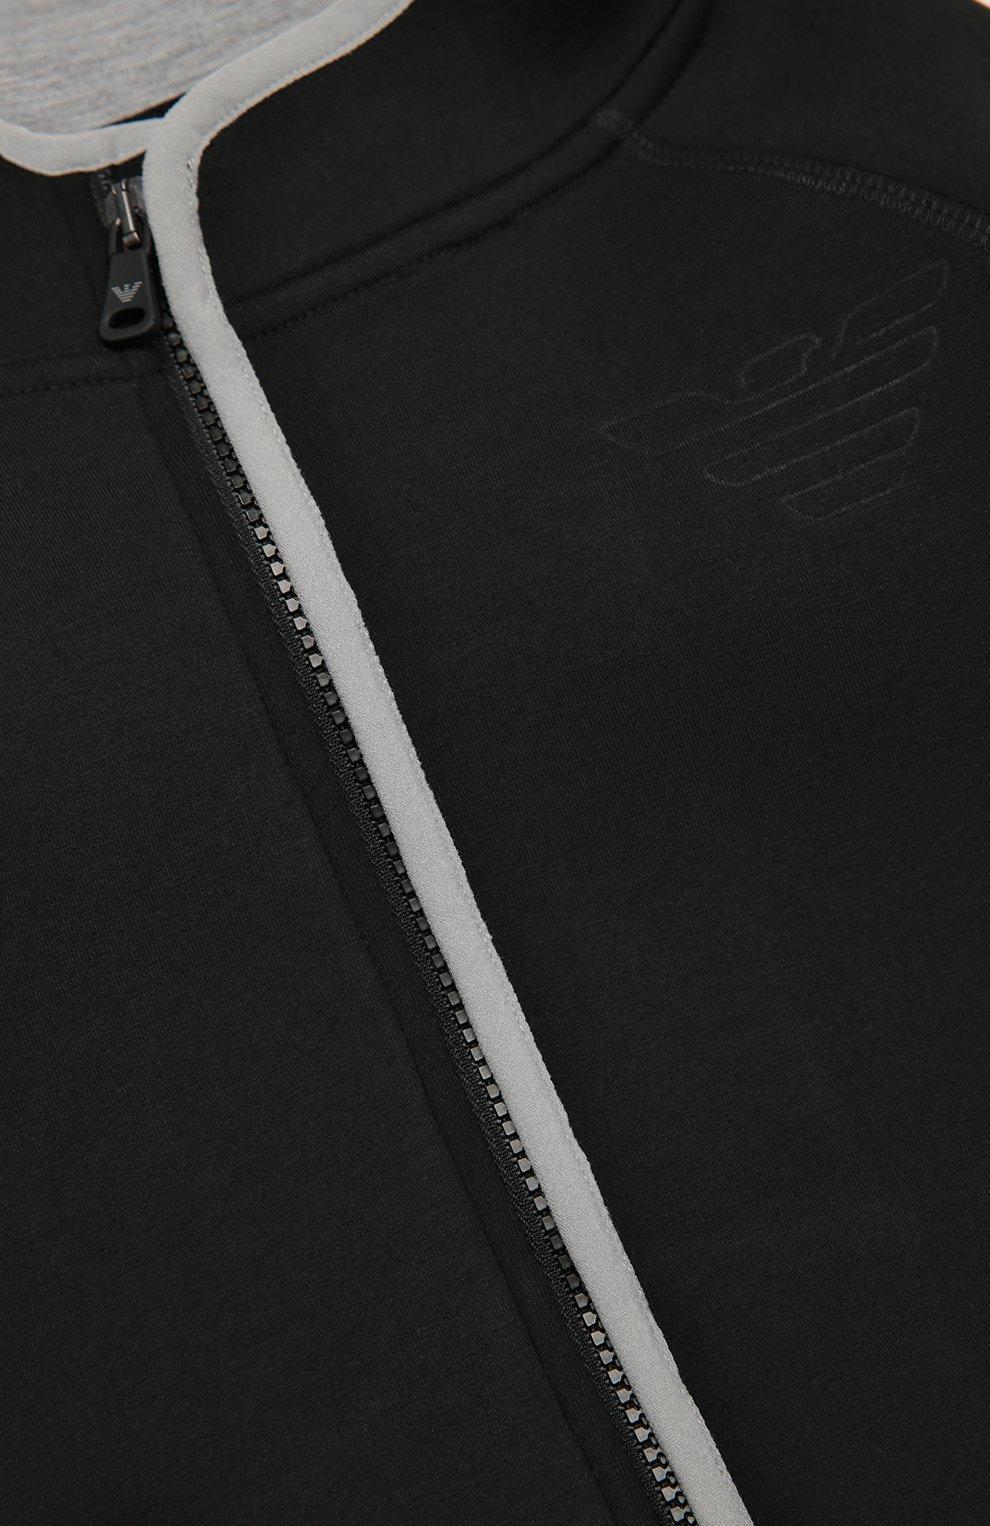 Кардиган из неопрена на молнии с капюшоном | Фото №3